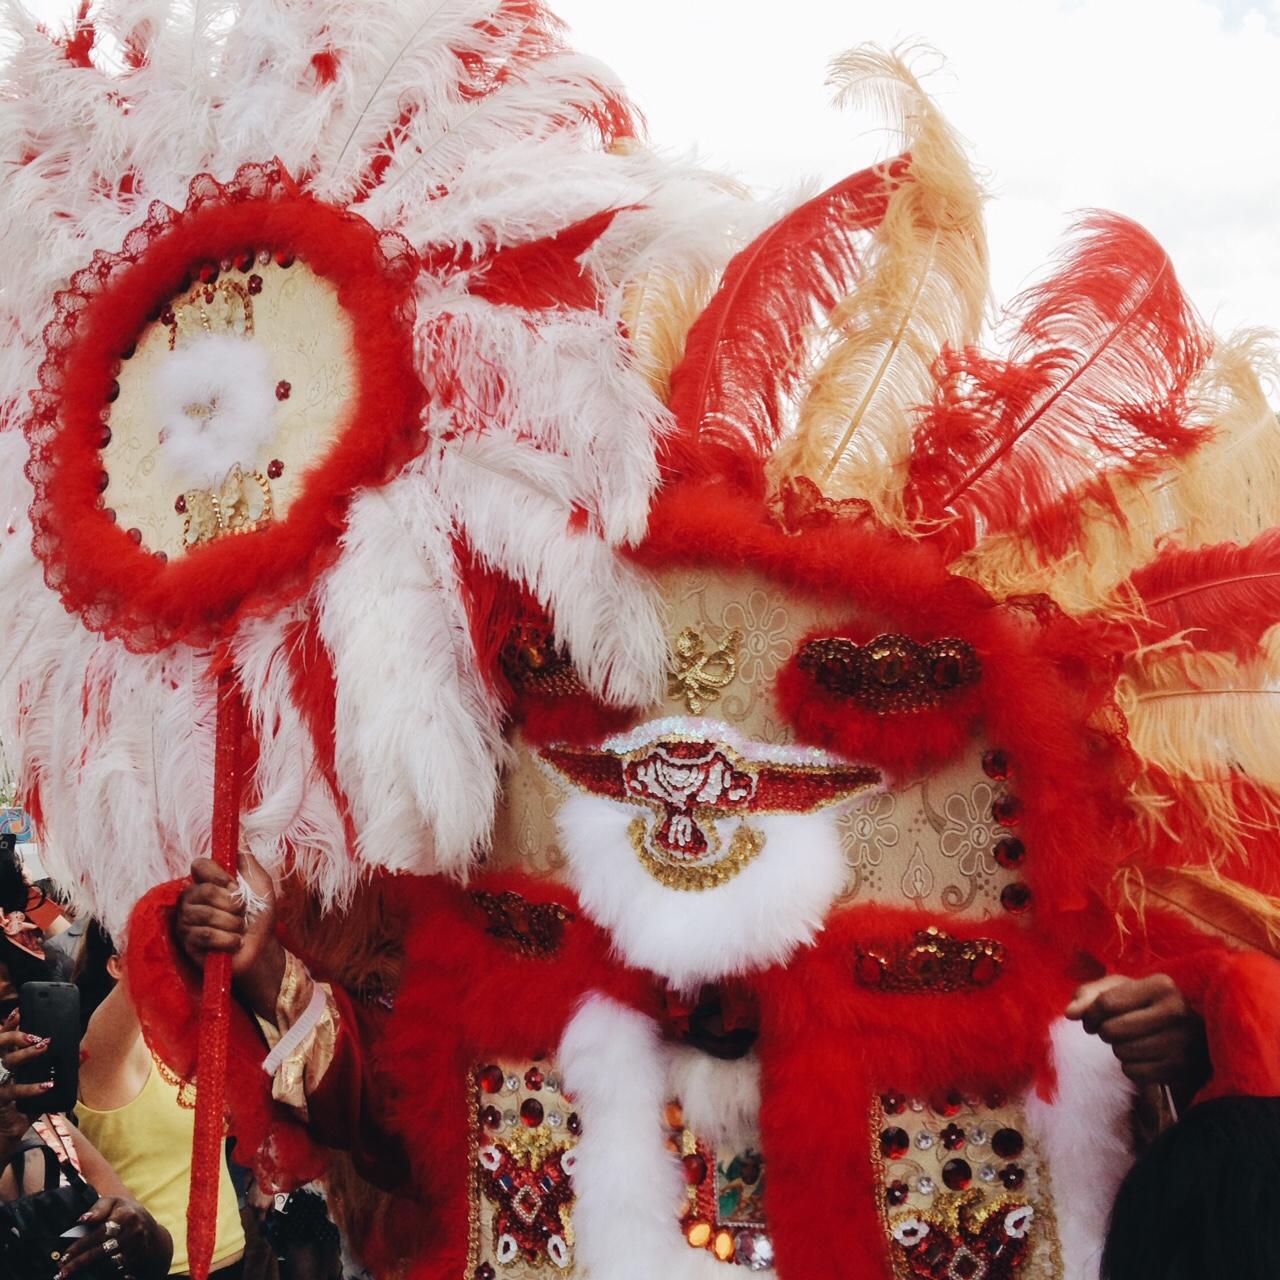 Mardi Gras Indians at Festival International de Louisiane 2015